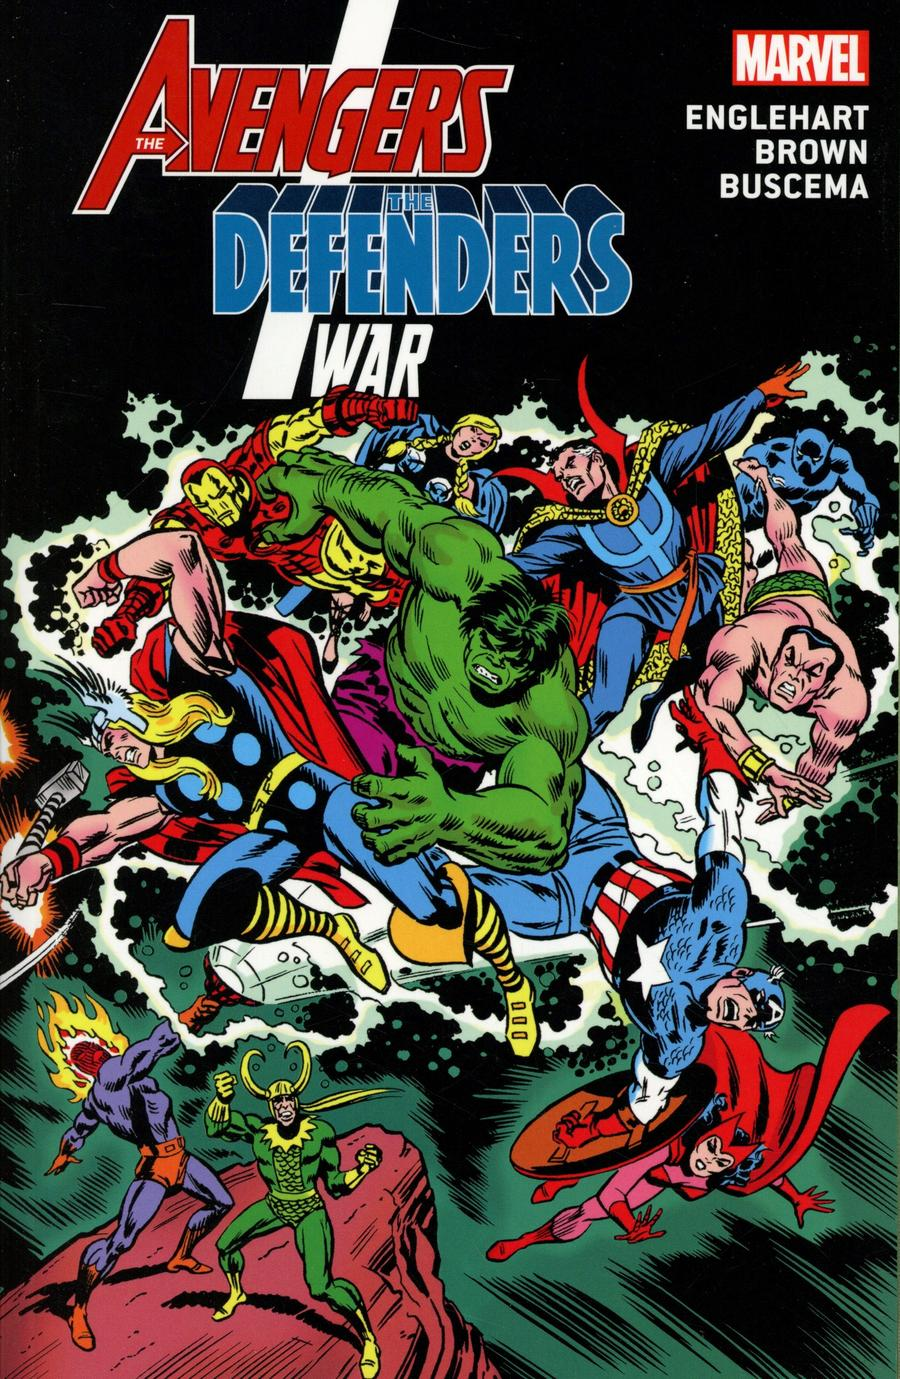 Avengers Defenders War TP New Printing (2019)